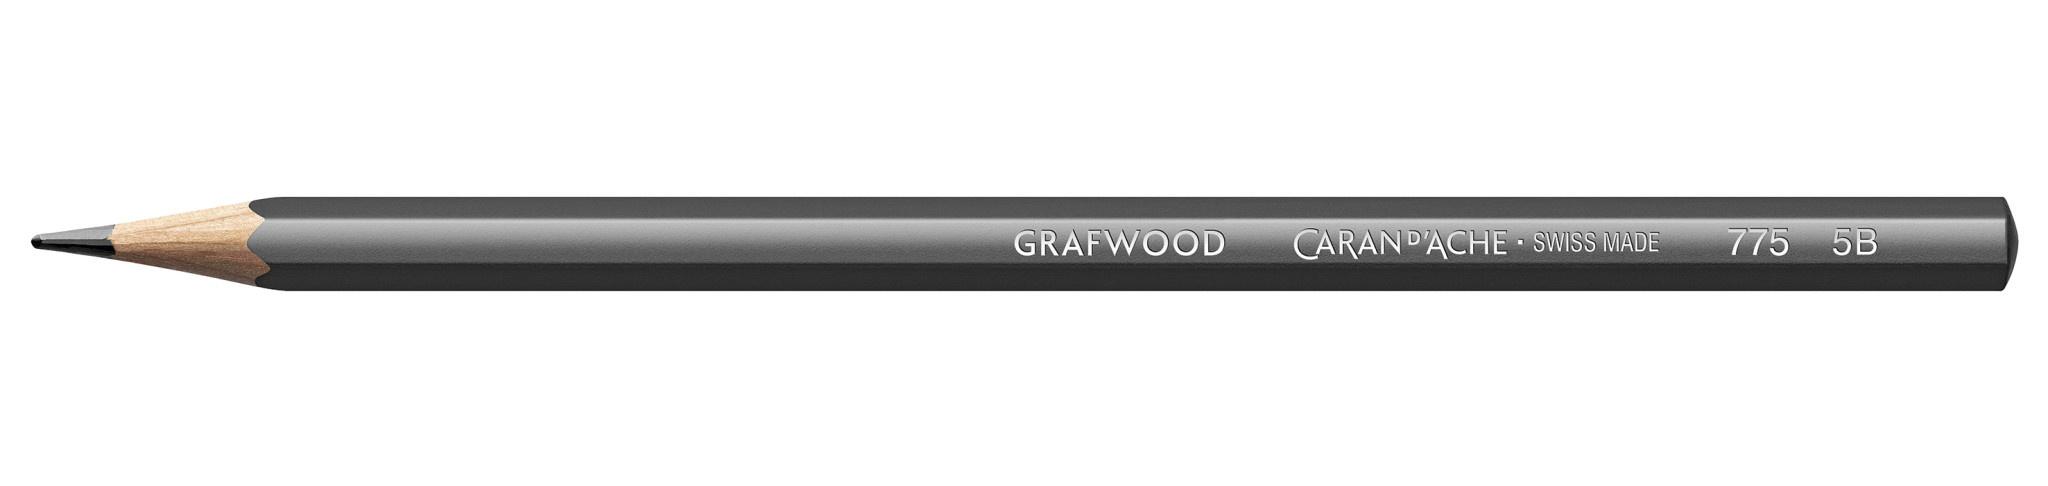 Caran d'Ache caran d'ache grafwood 5B